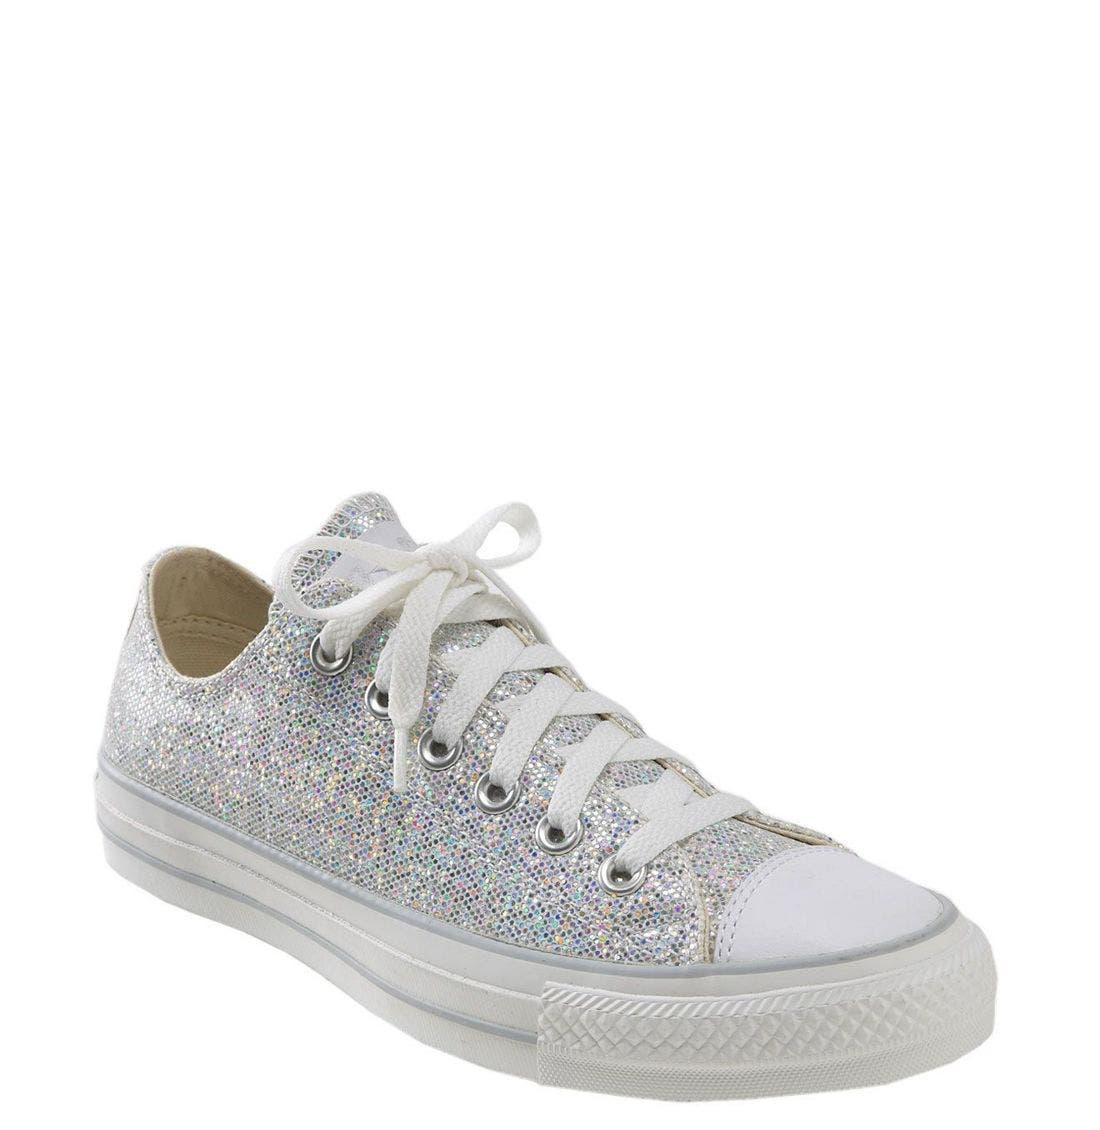 converse chuck taylor glitter